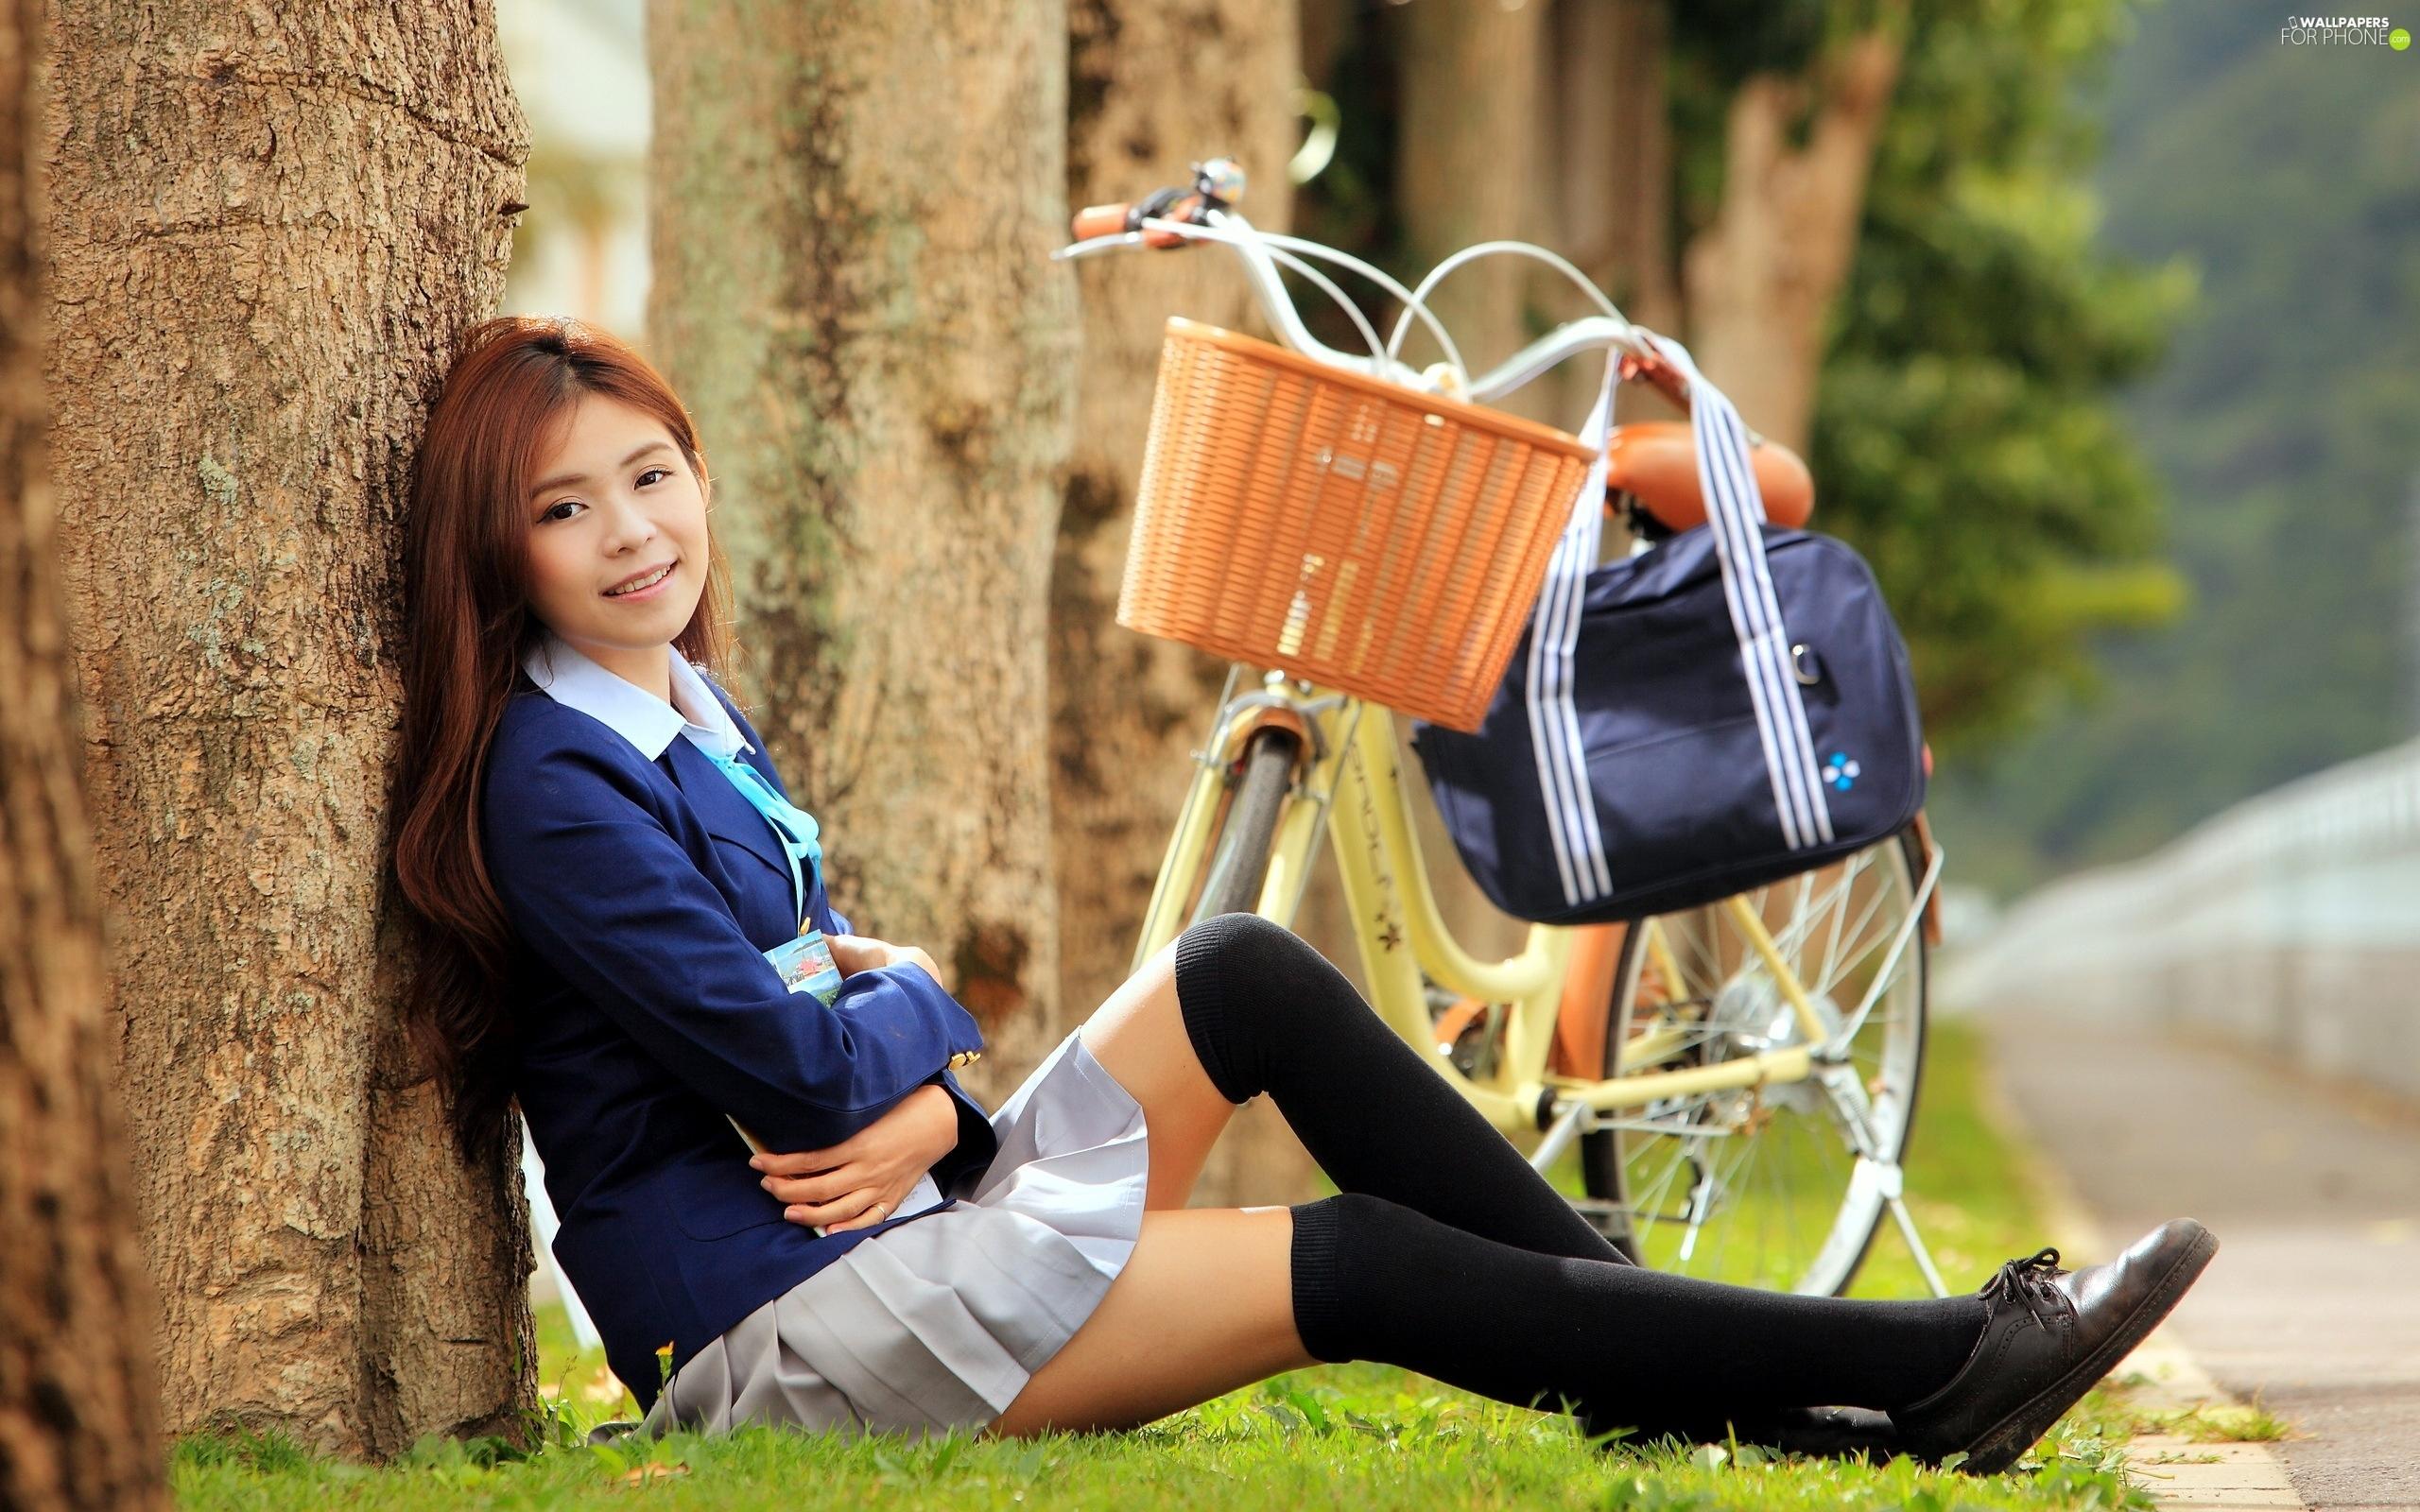 Girl On Bike Hd Wallpaper Way Smiling Viewes Bike Trees Japanese Girl For